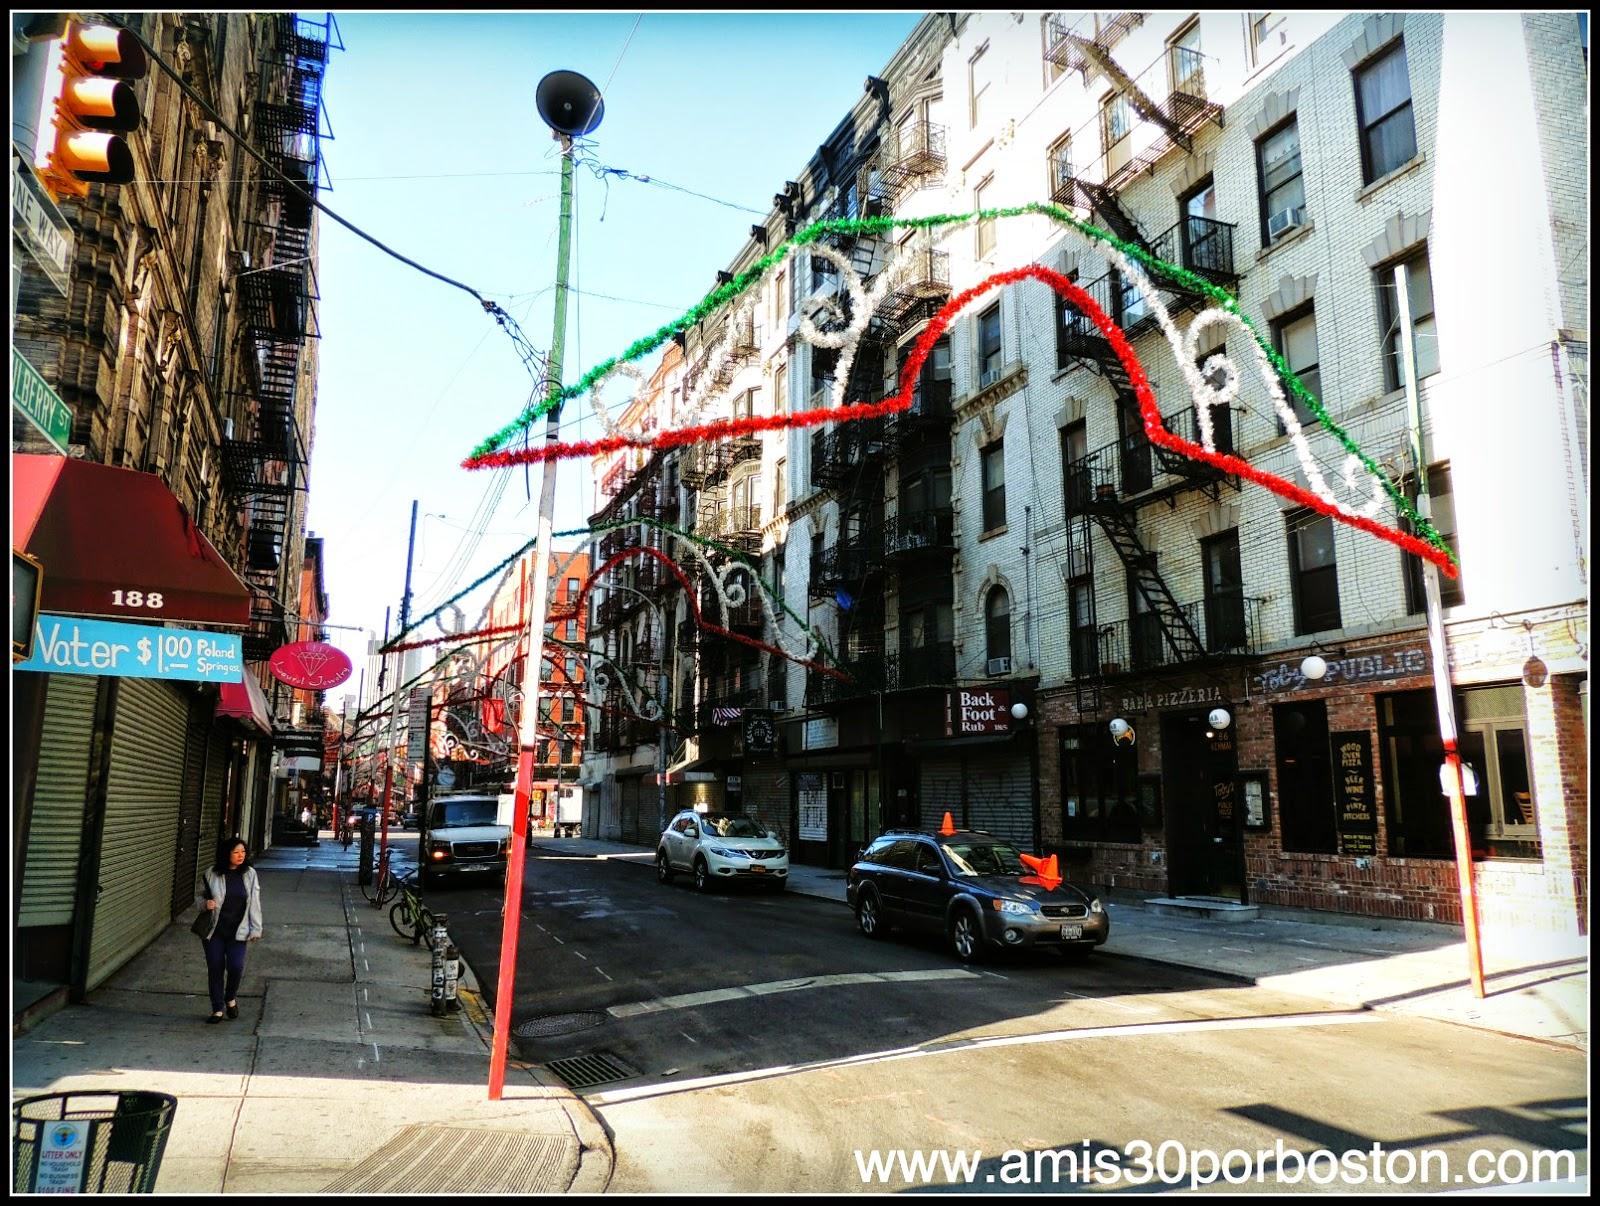 Segunda Visita a Nueva York: Little Italy